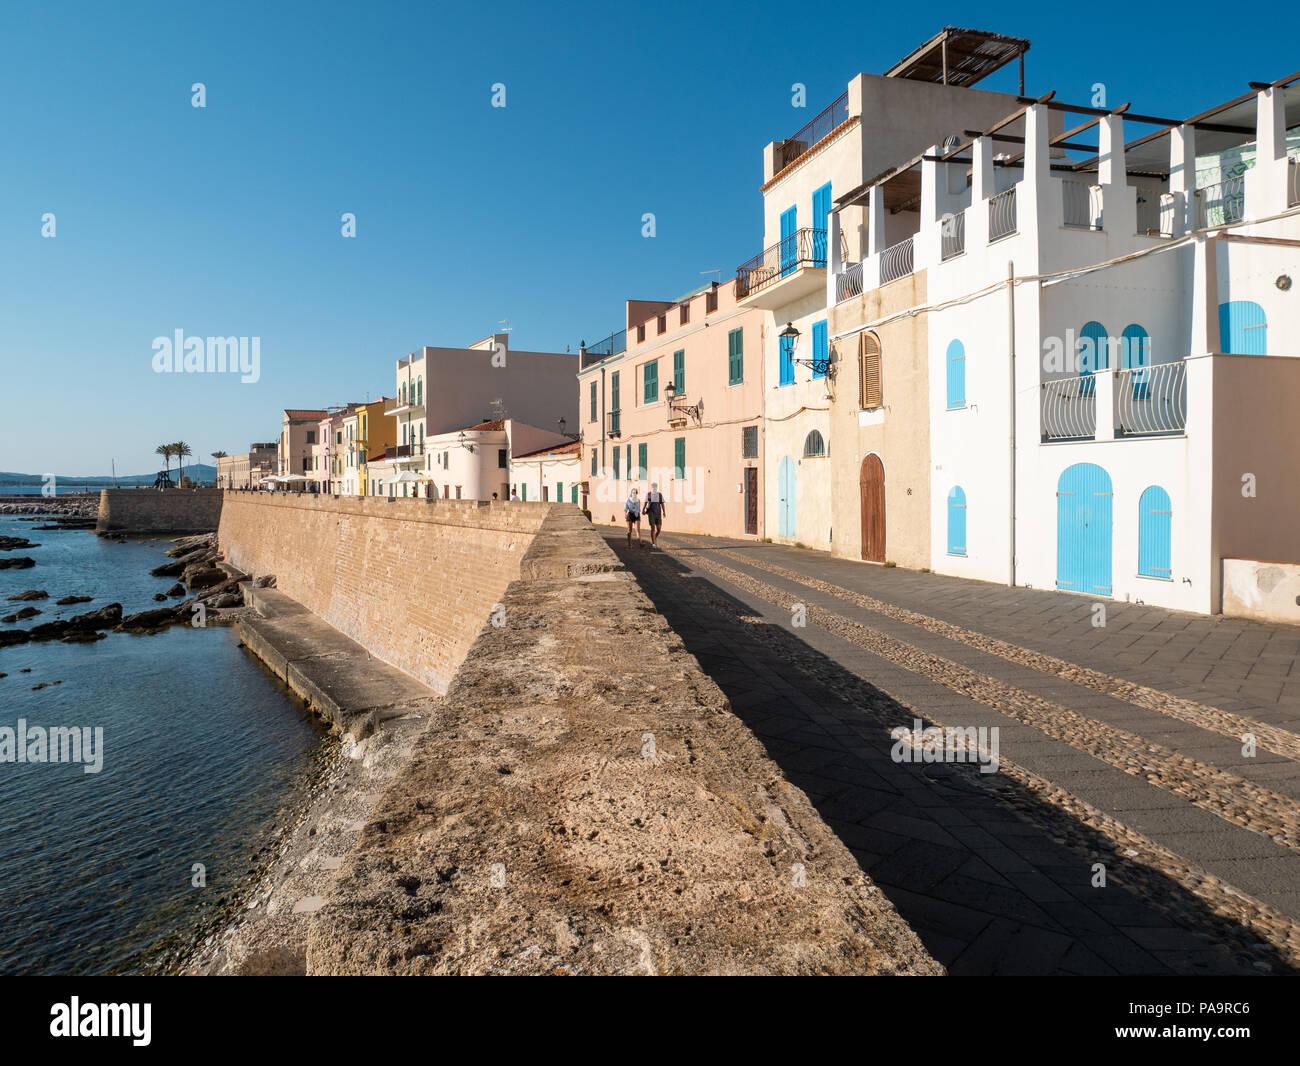 Waterfront Promenade, Alghero, Sardinien, Italien Stockbild